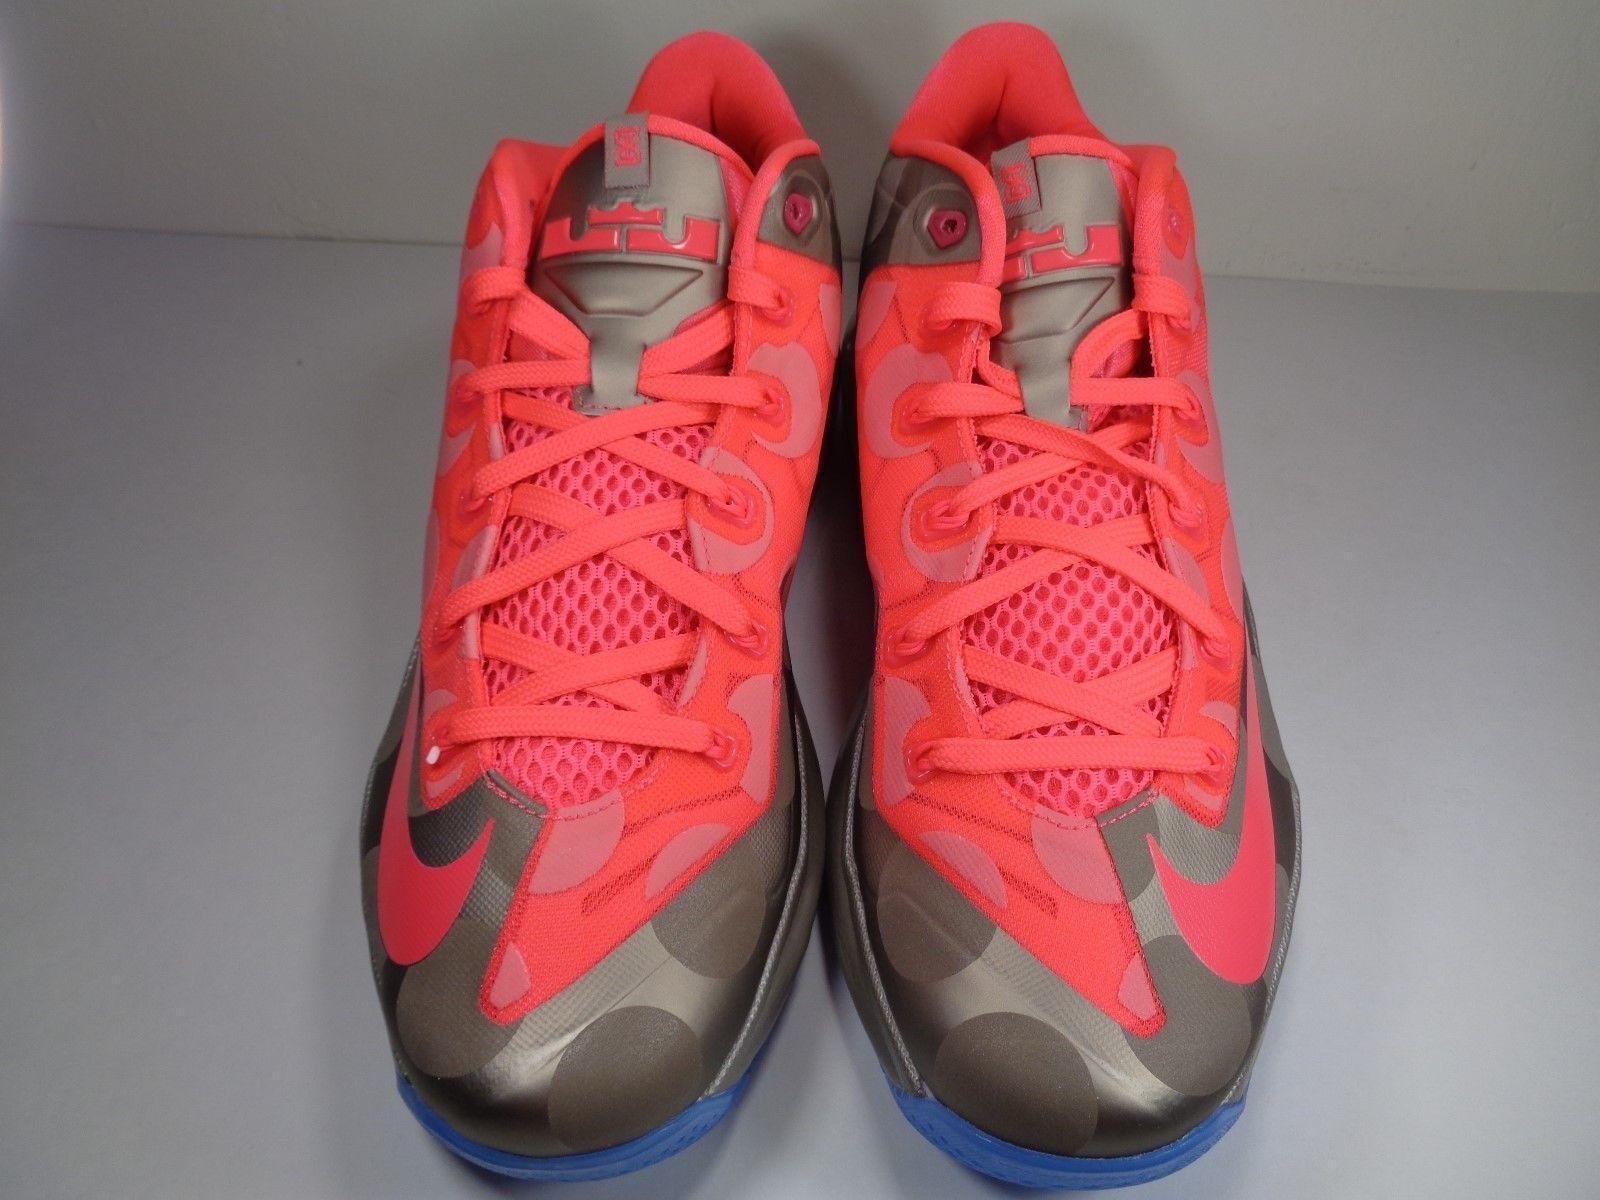 150d81474d30 ... Nike Air Max Lebron Lebron Lebron Xi 11 Niedrig Se Maison Du Hyper  Punch Sz 8.5 ...